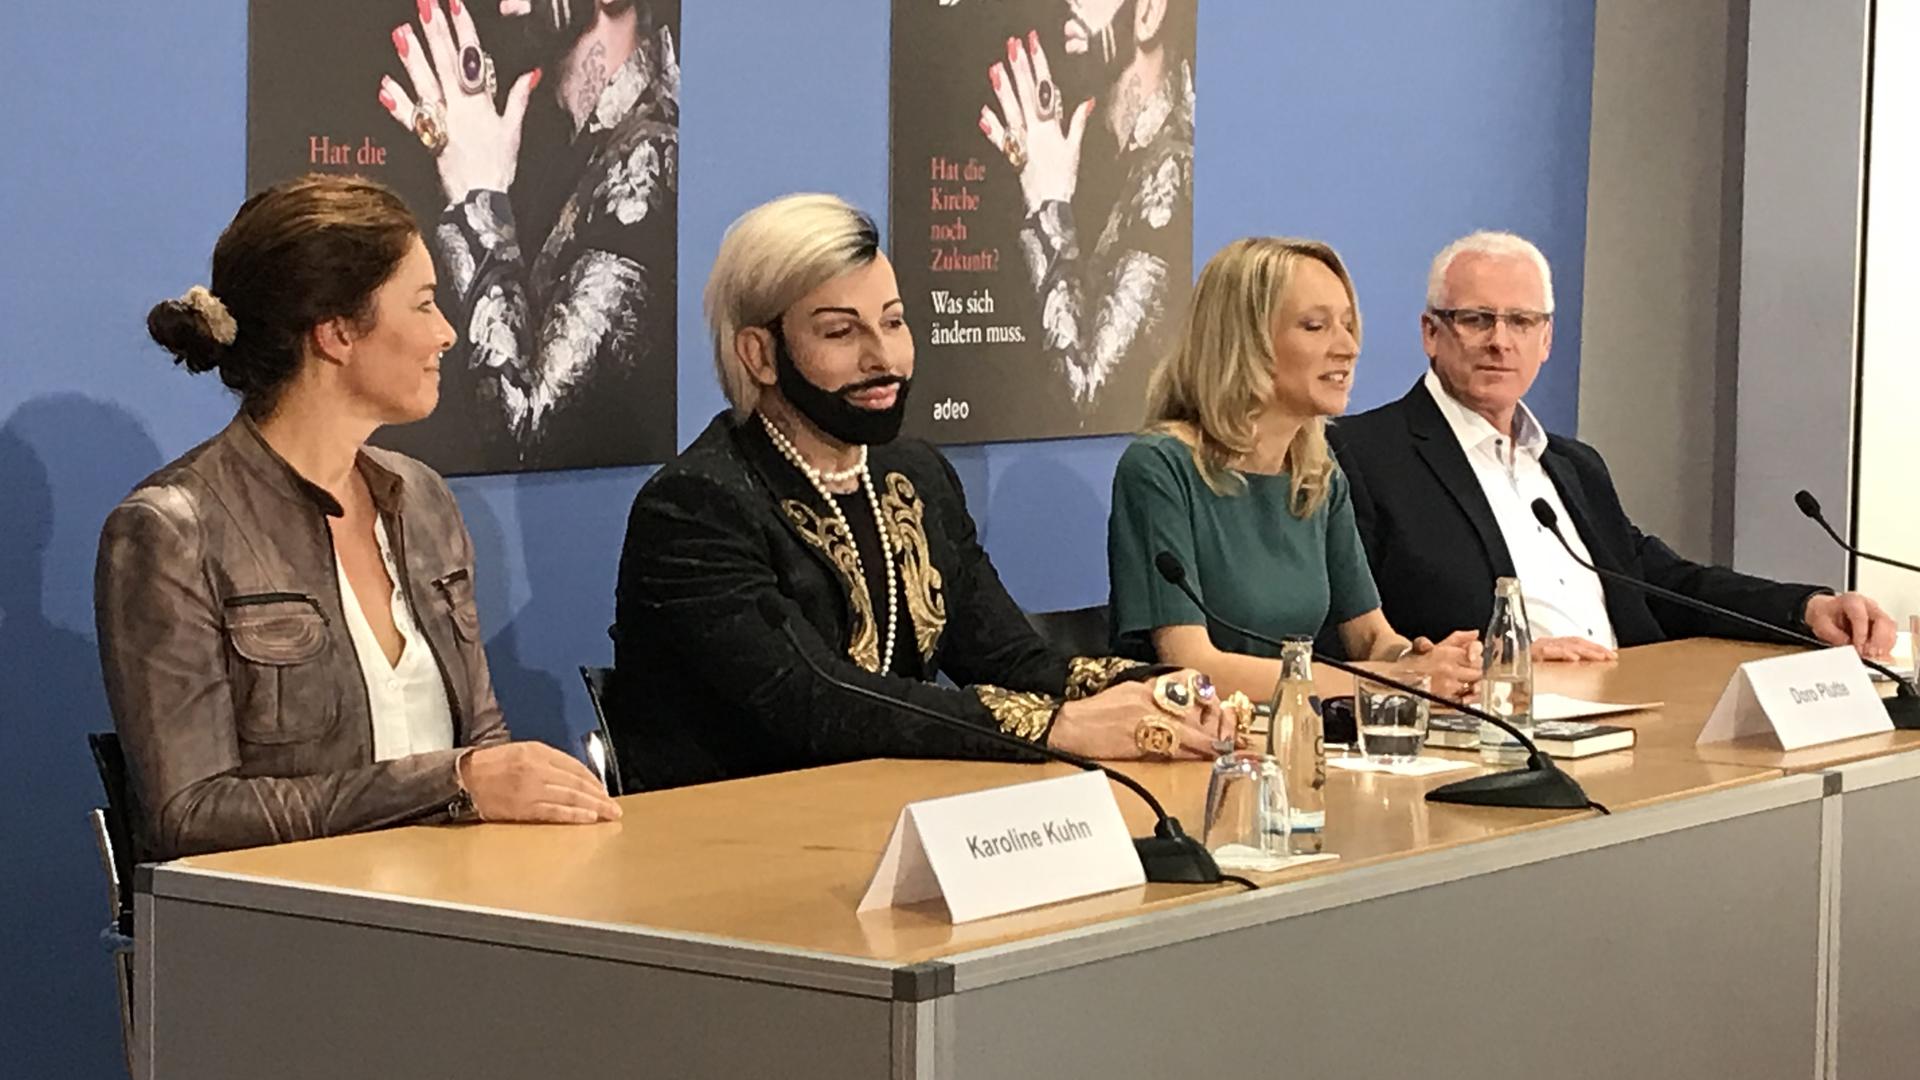 Pressekonferenz in Berlin (v.l.): Karoline Kuhn von Adeo, Harald Glööckler, Moderatorin Doro Plutte und Verlagsleiter Detlef Holtgrefe